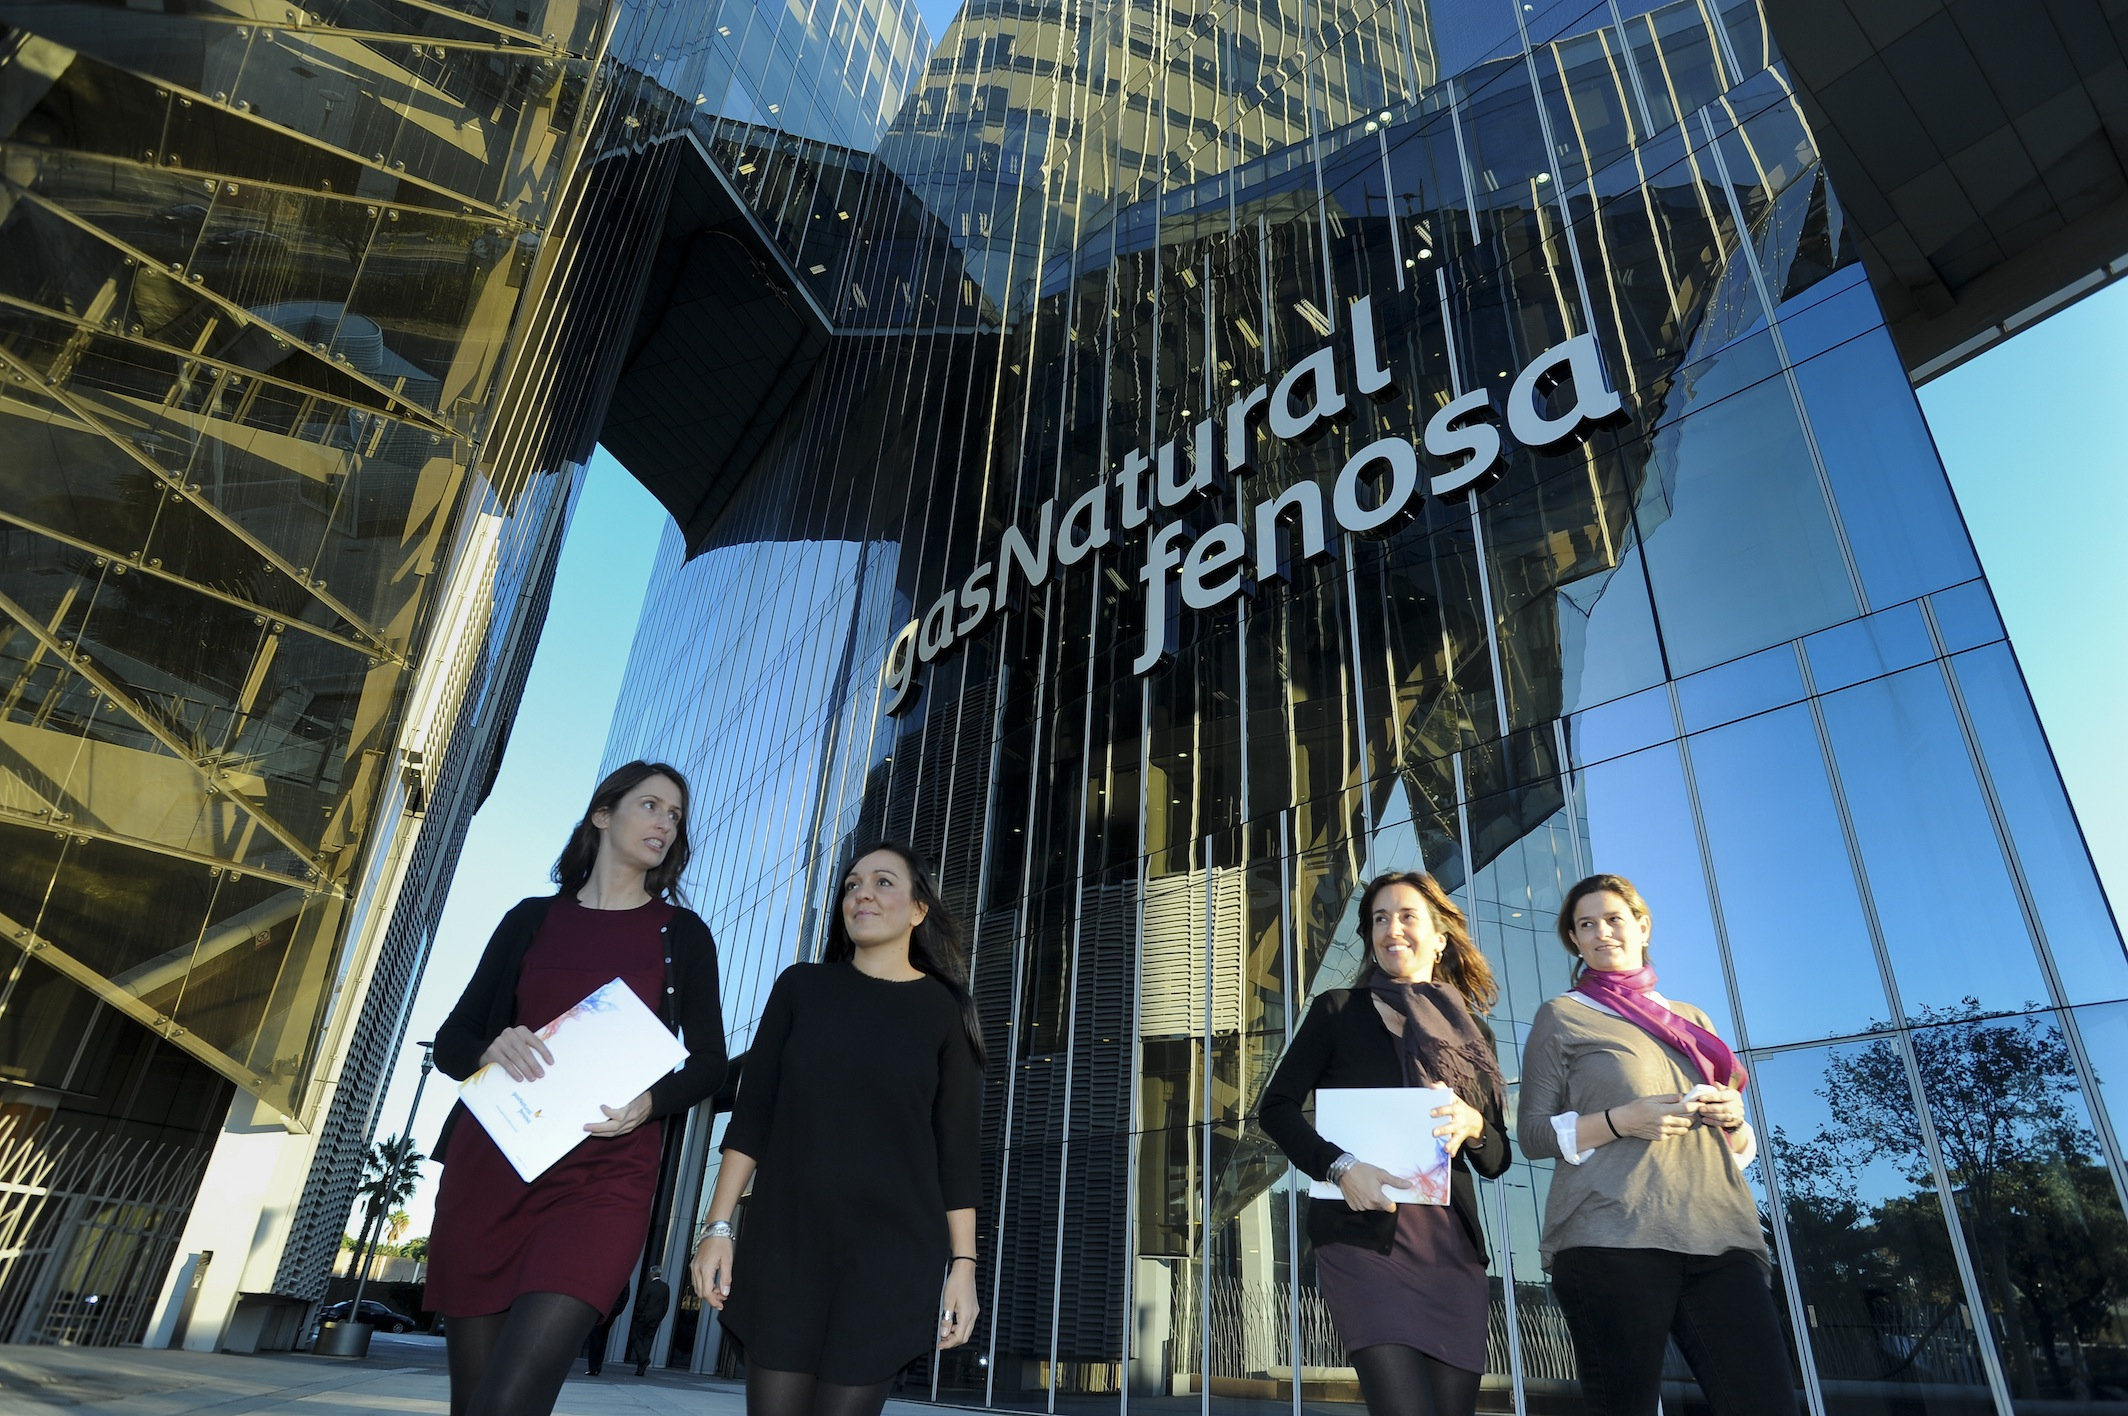 The company Gas Natural Fenosa